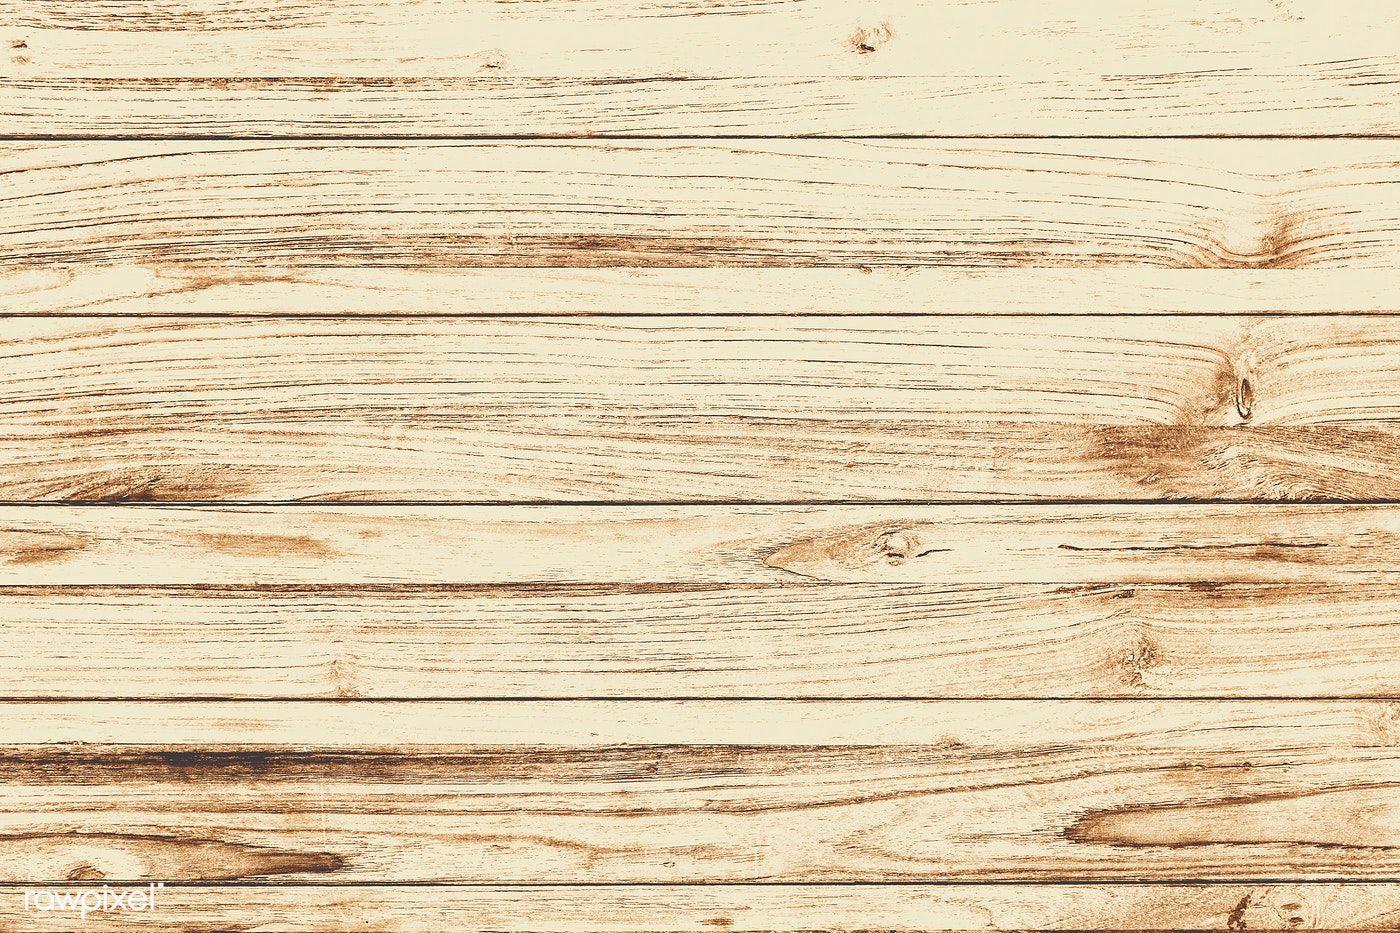 Vintage Wooden Plank Textured Background Free Image By Rawpixel Com Textured Background Wooden Planks Wood Texture Background